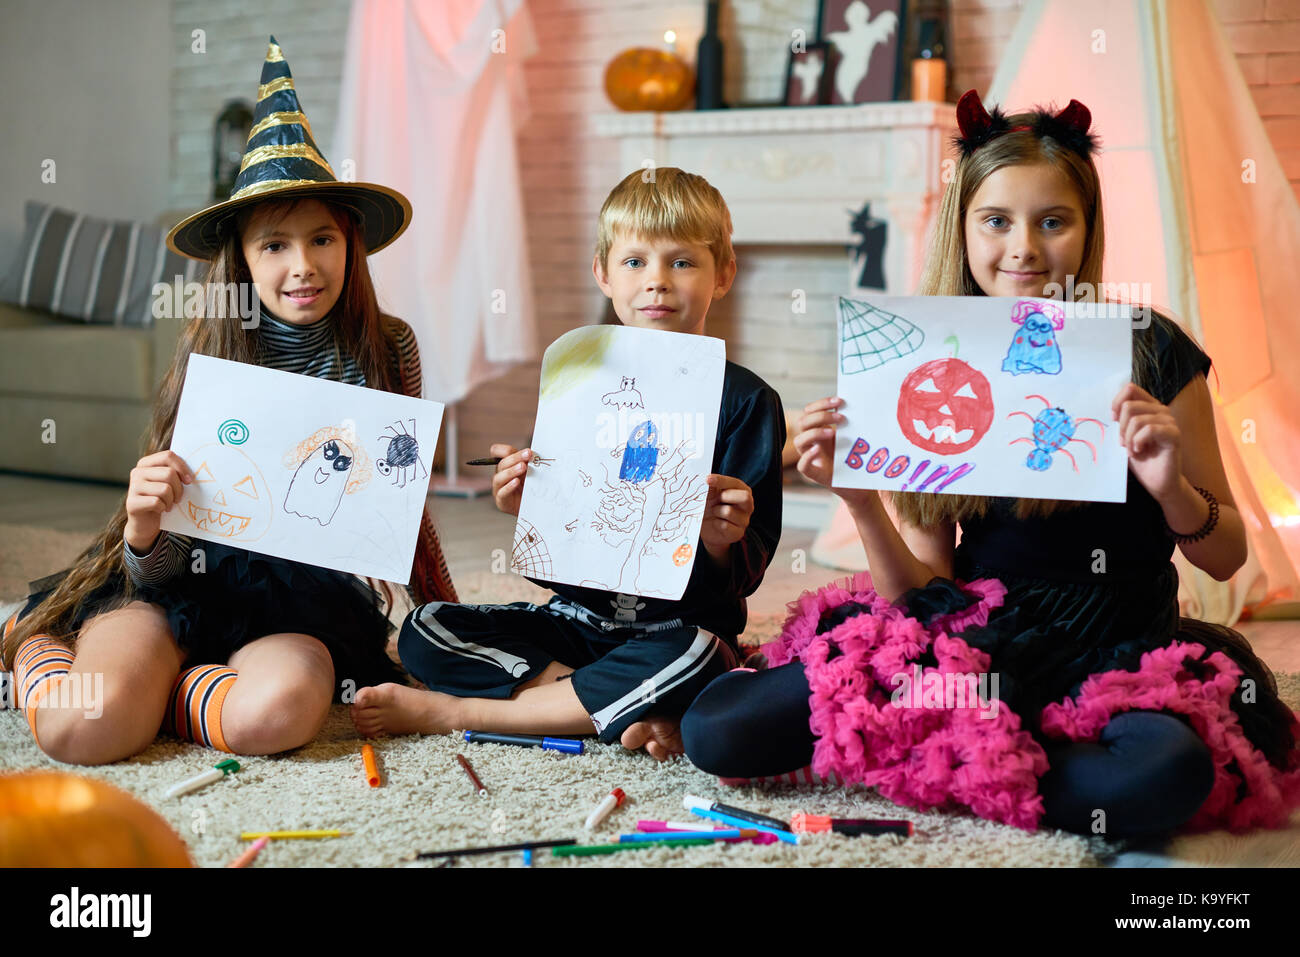 Cute Friend Halloween Costumes.Positive Cute Friends In Halloween Costumes Sitting On